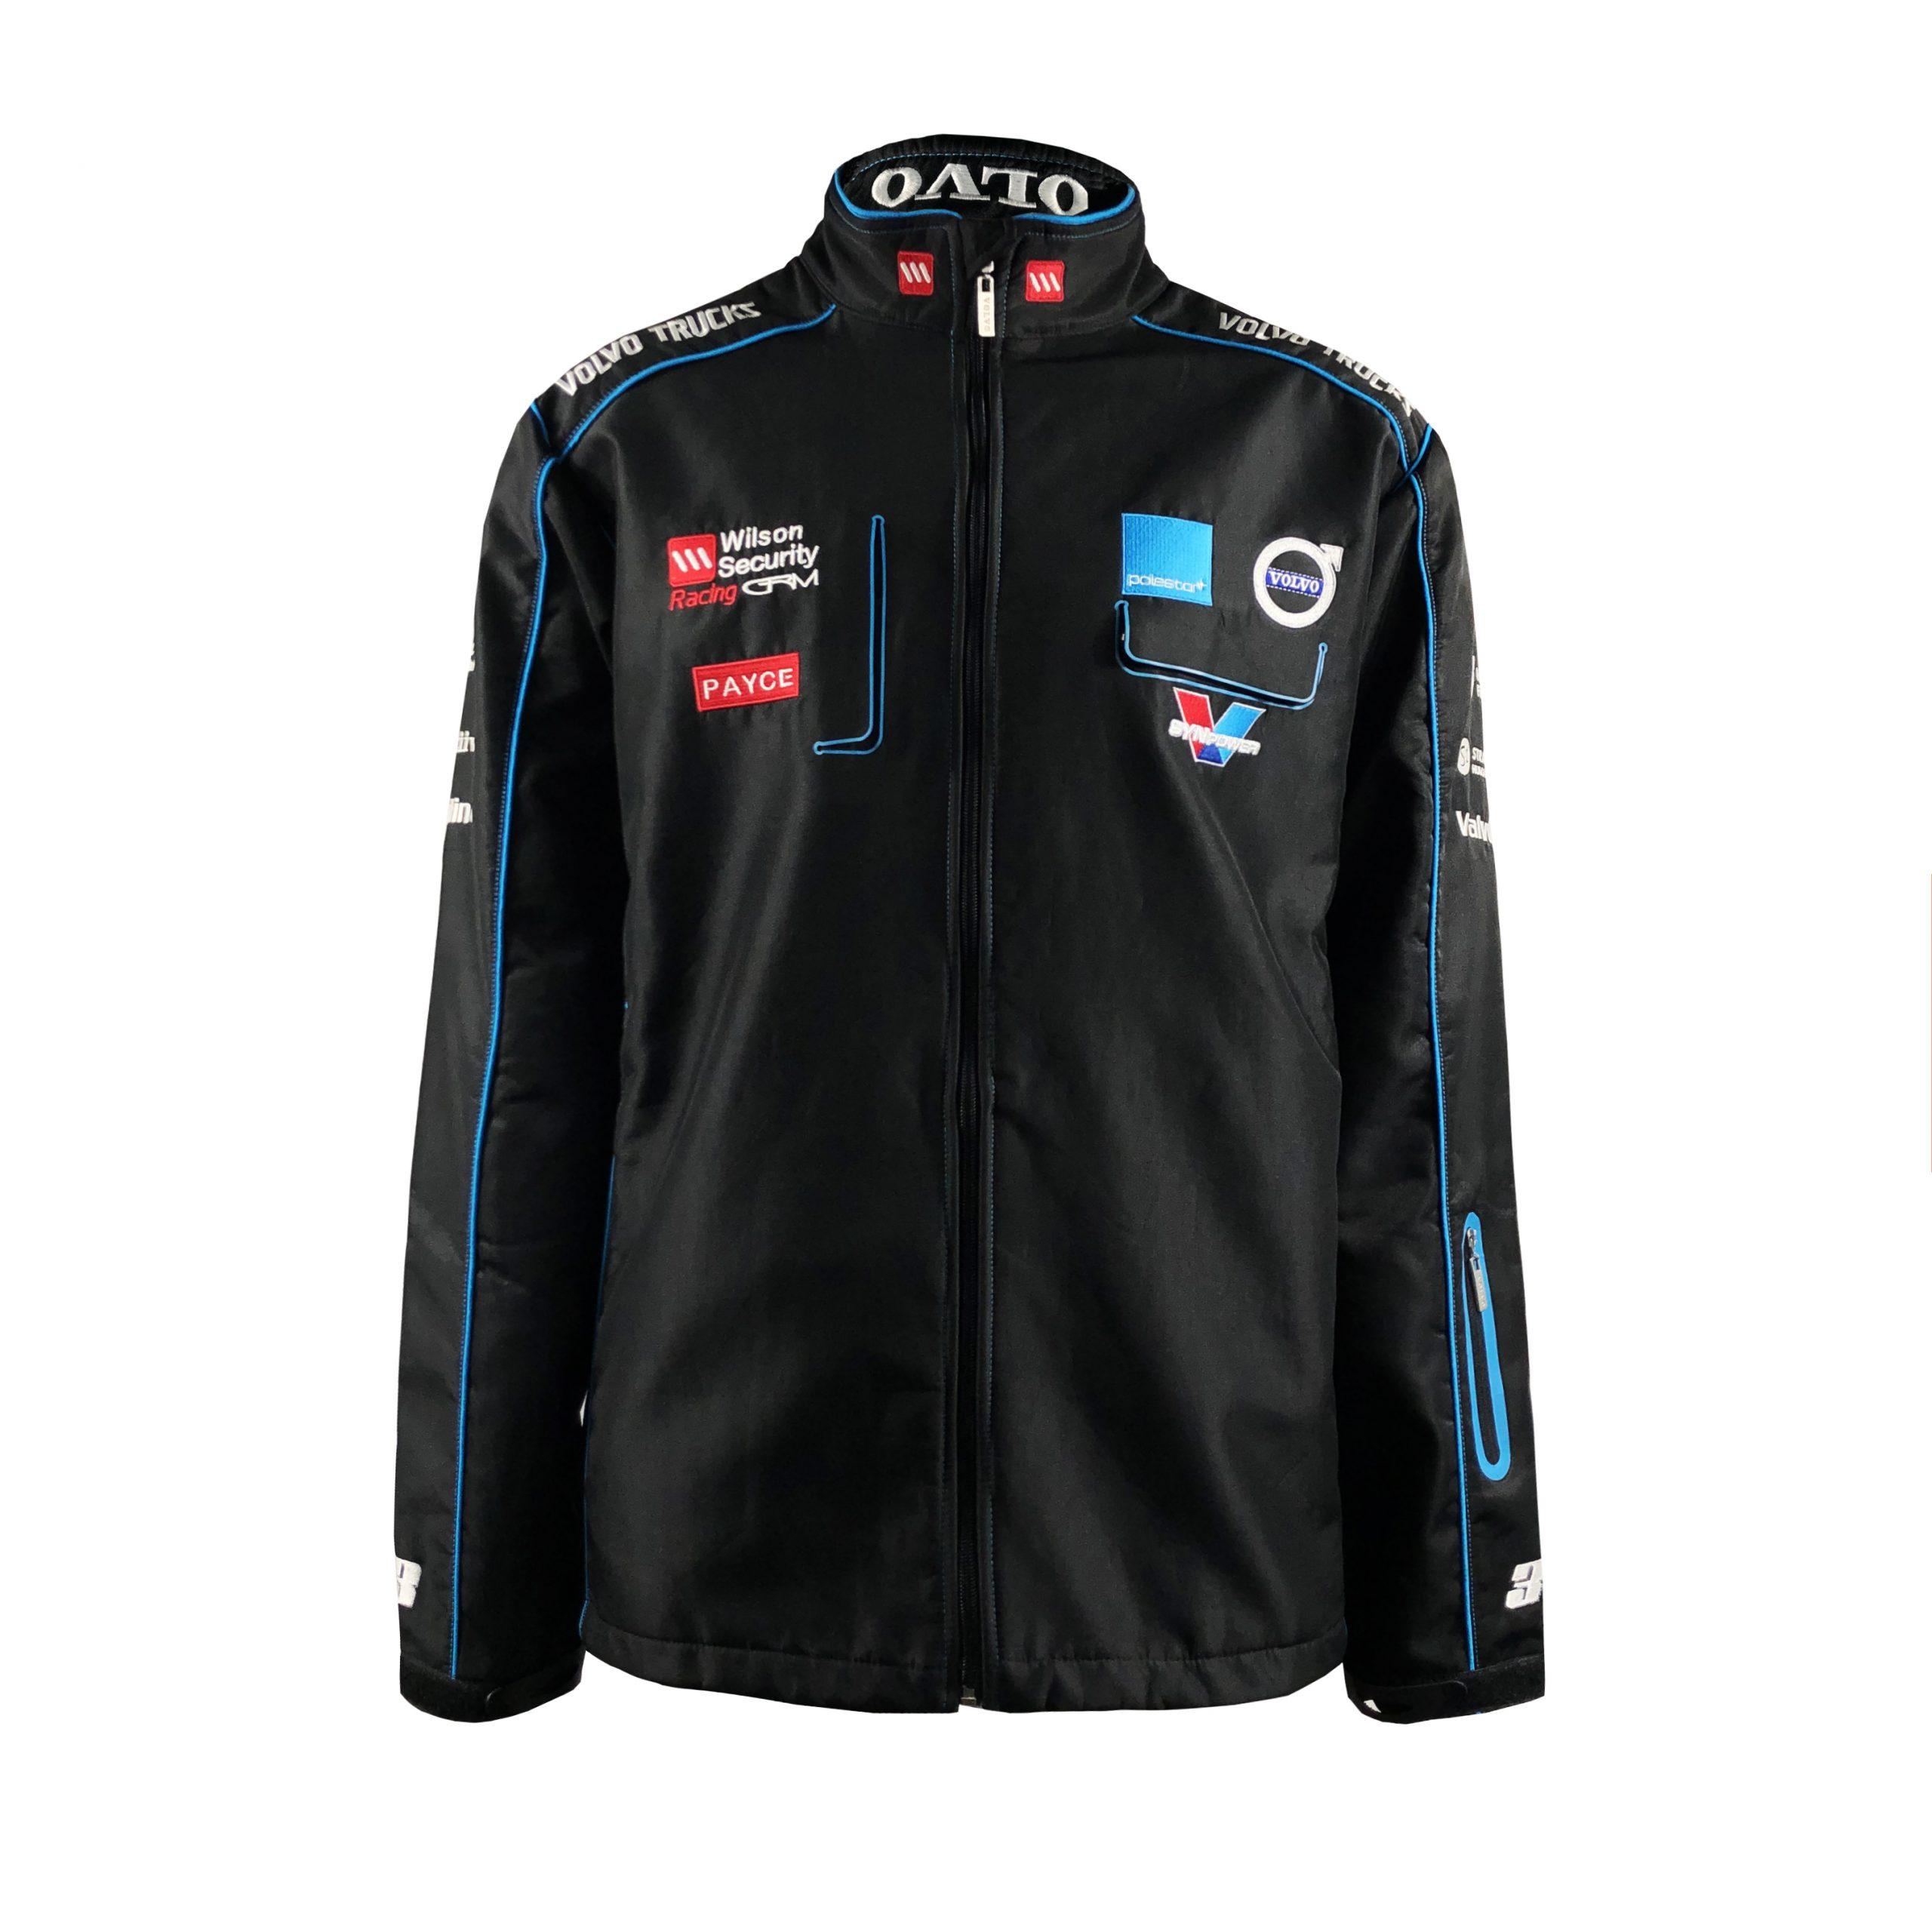 Racing Club Clothing Staff Wear Events Jacket ...